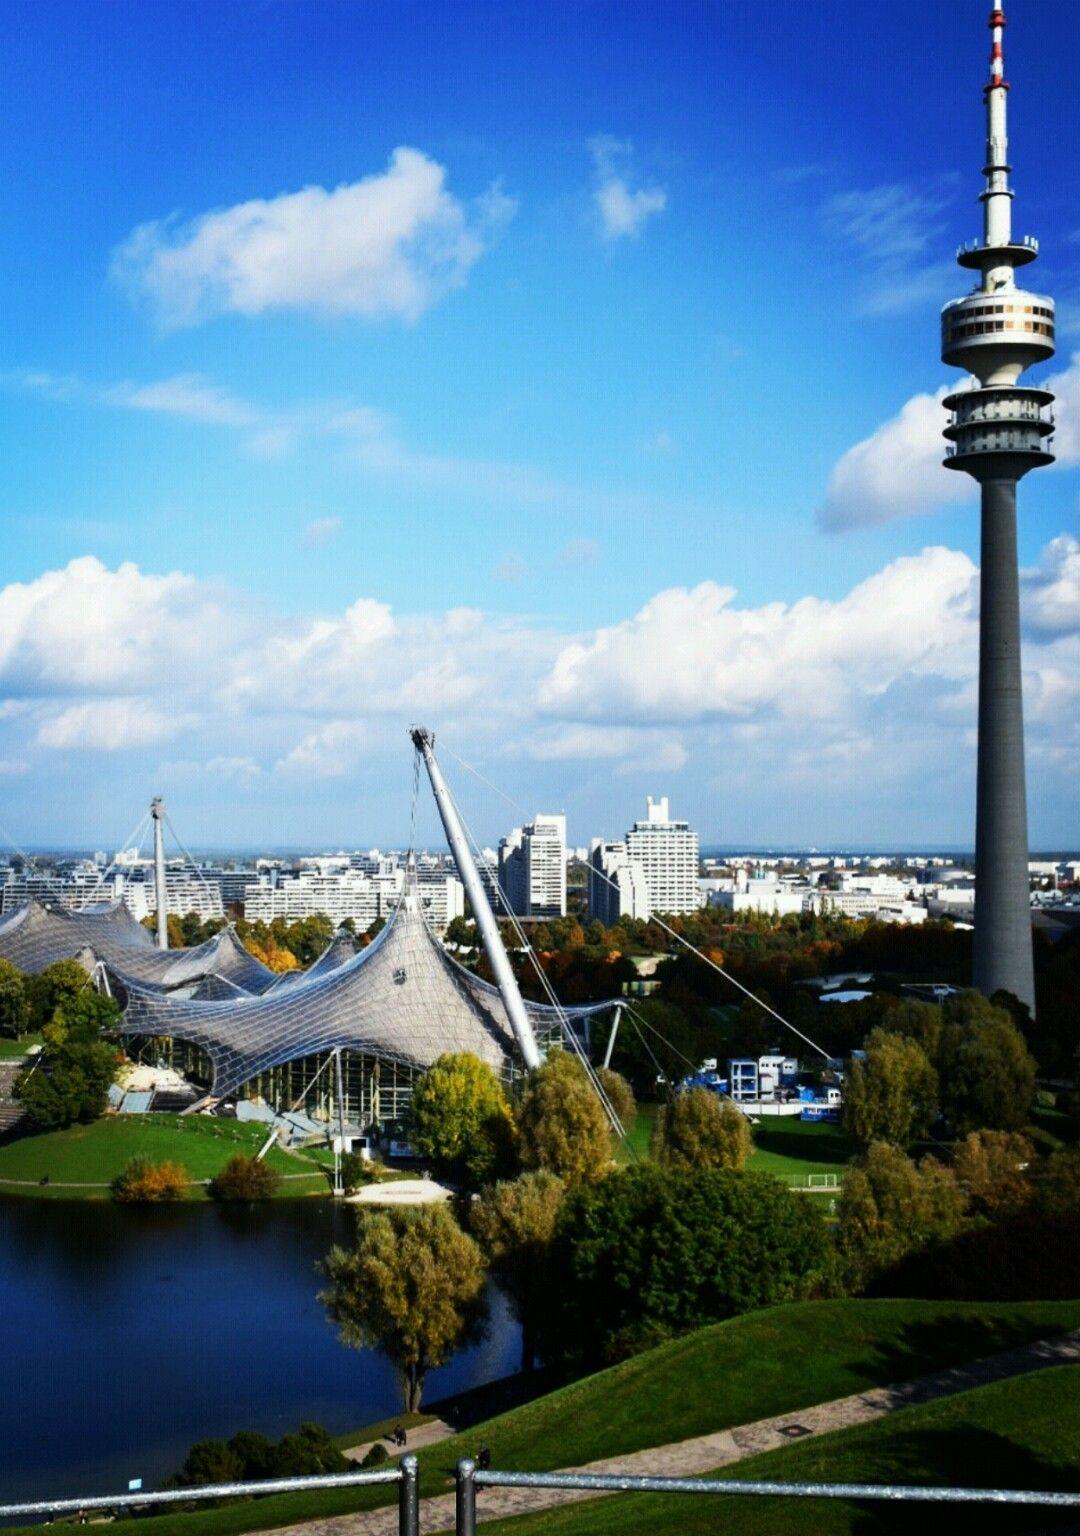 Olympiapark Munchen Munich Travel Munich Germany Germany